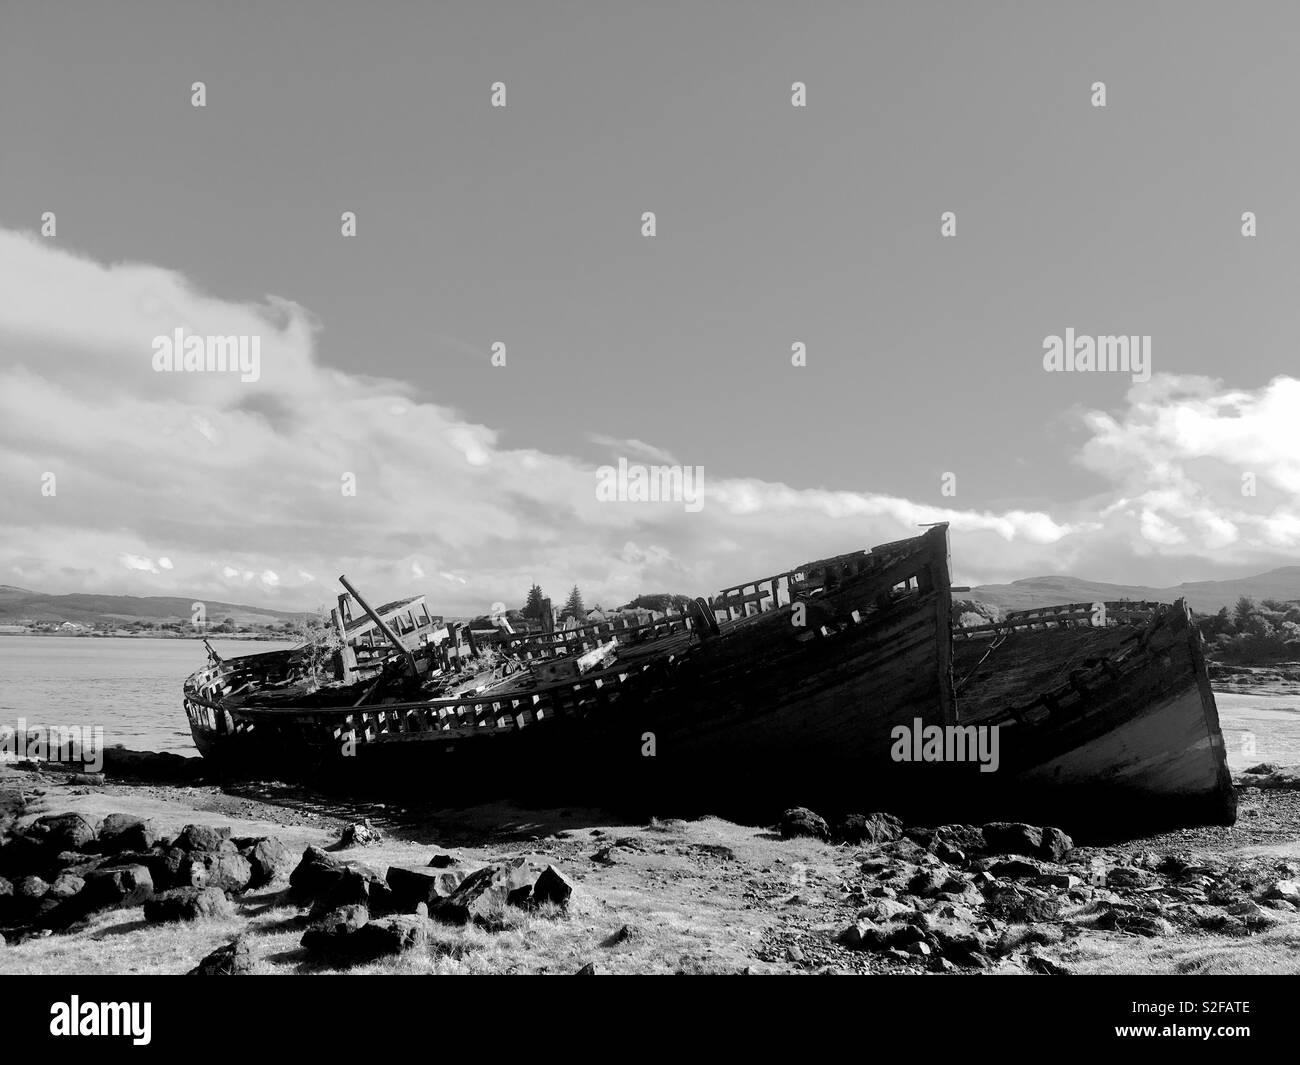 Salen Boats on the Isle of Mull, Inner Hebrides Scotland - Stock Image